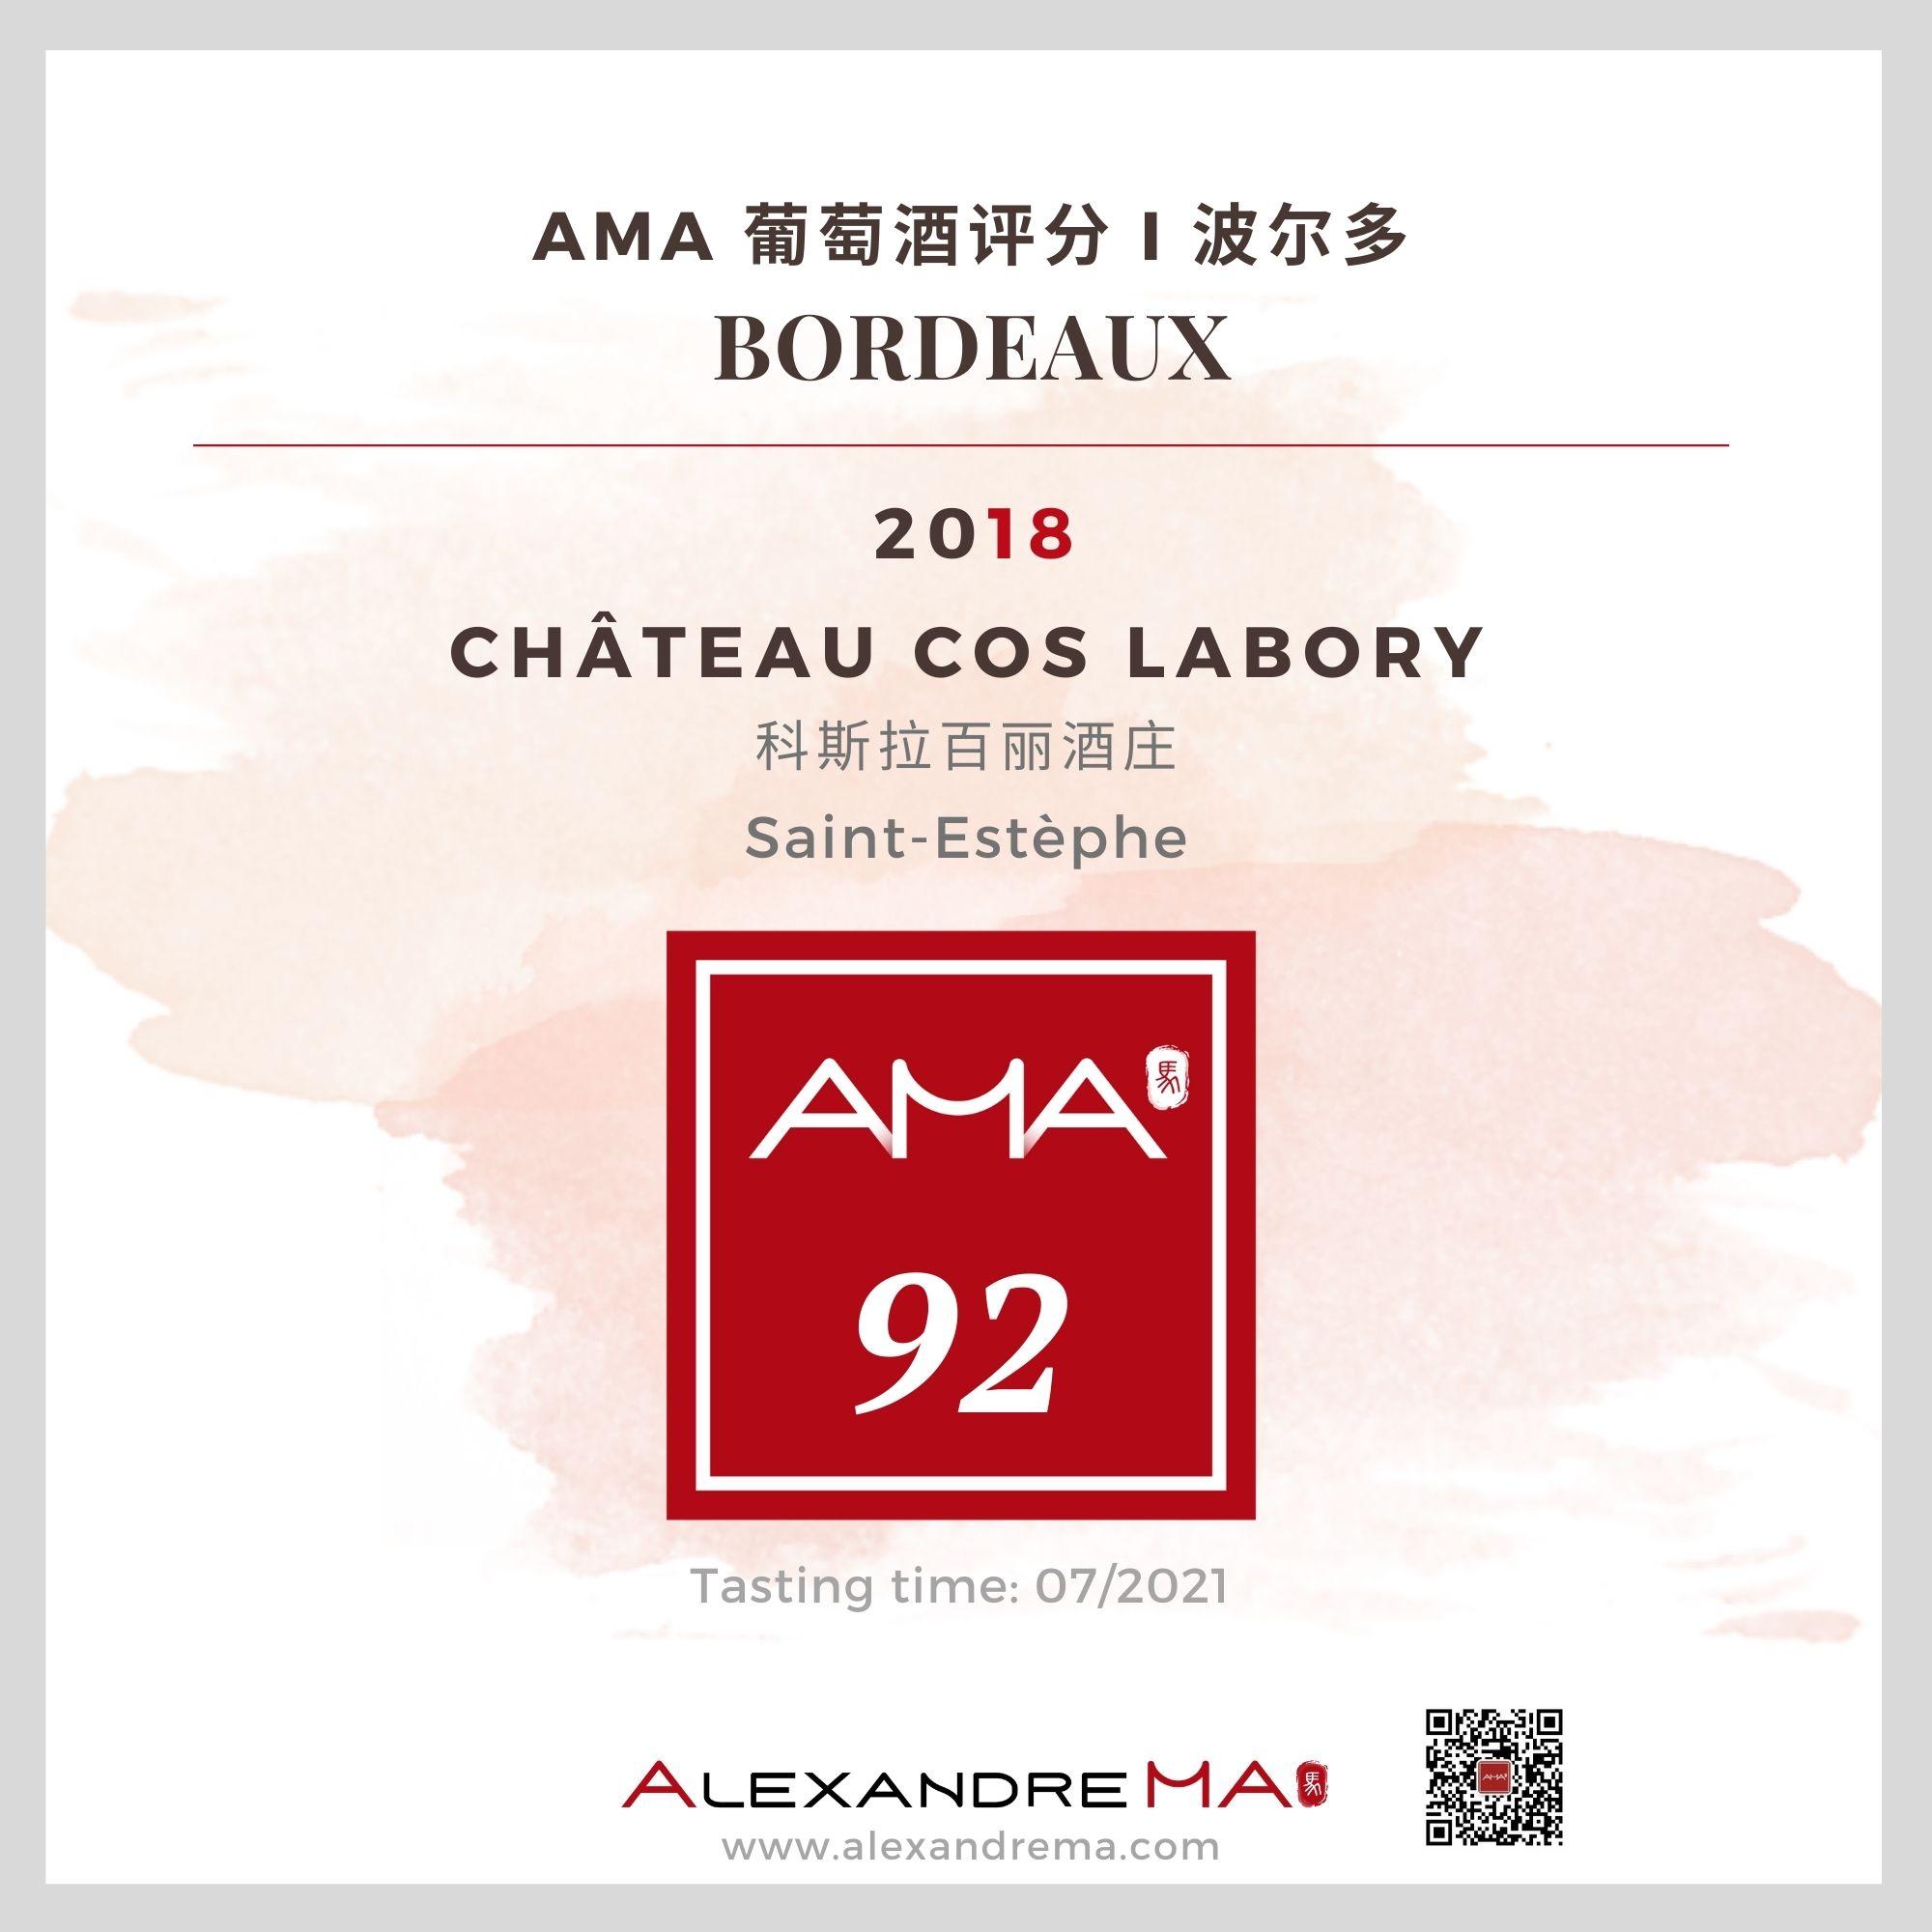 Château Cos Labory 2018 柯斯拉百丽酒庄 - Alexandre Ma